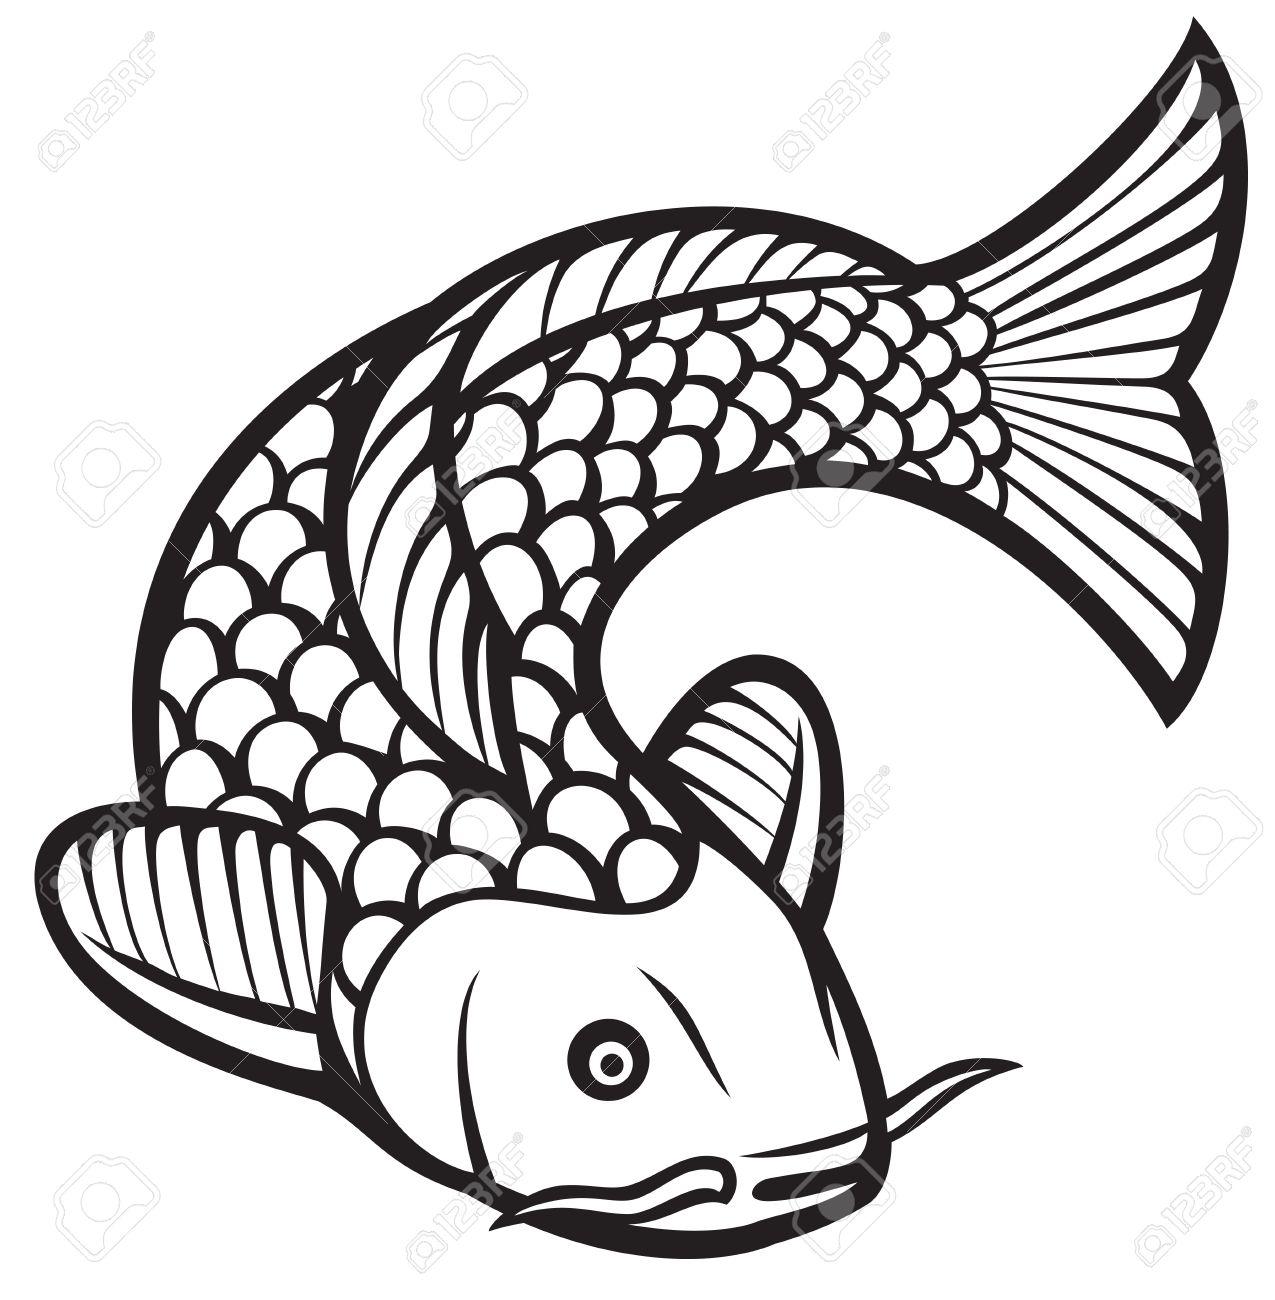 koi fish vector illustration of a japanese or chinese inspired rh 123rf com koi fish vector png koi fish vector art